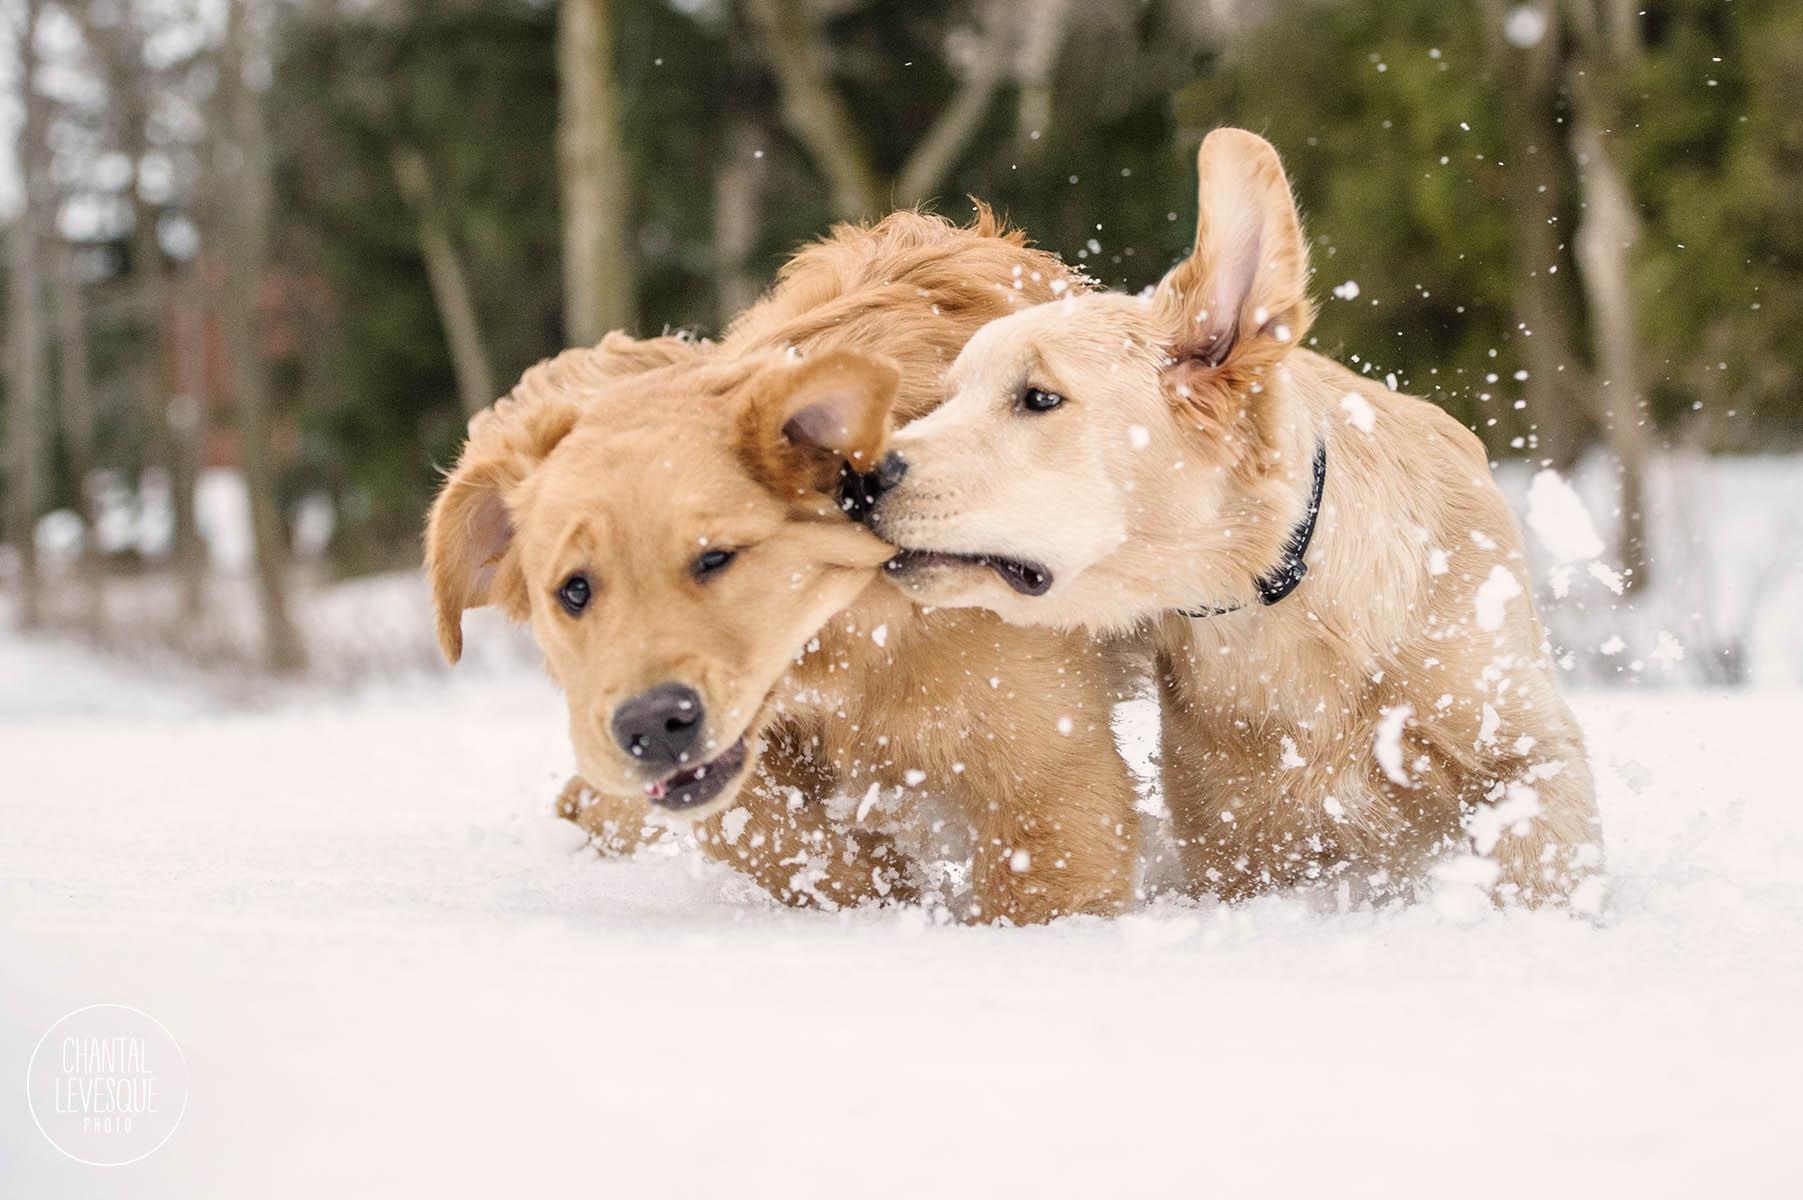 chiots-jouer-neige-photographie-quebec.jpg